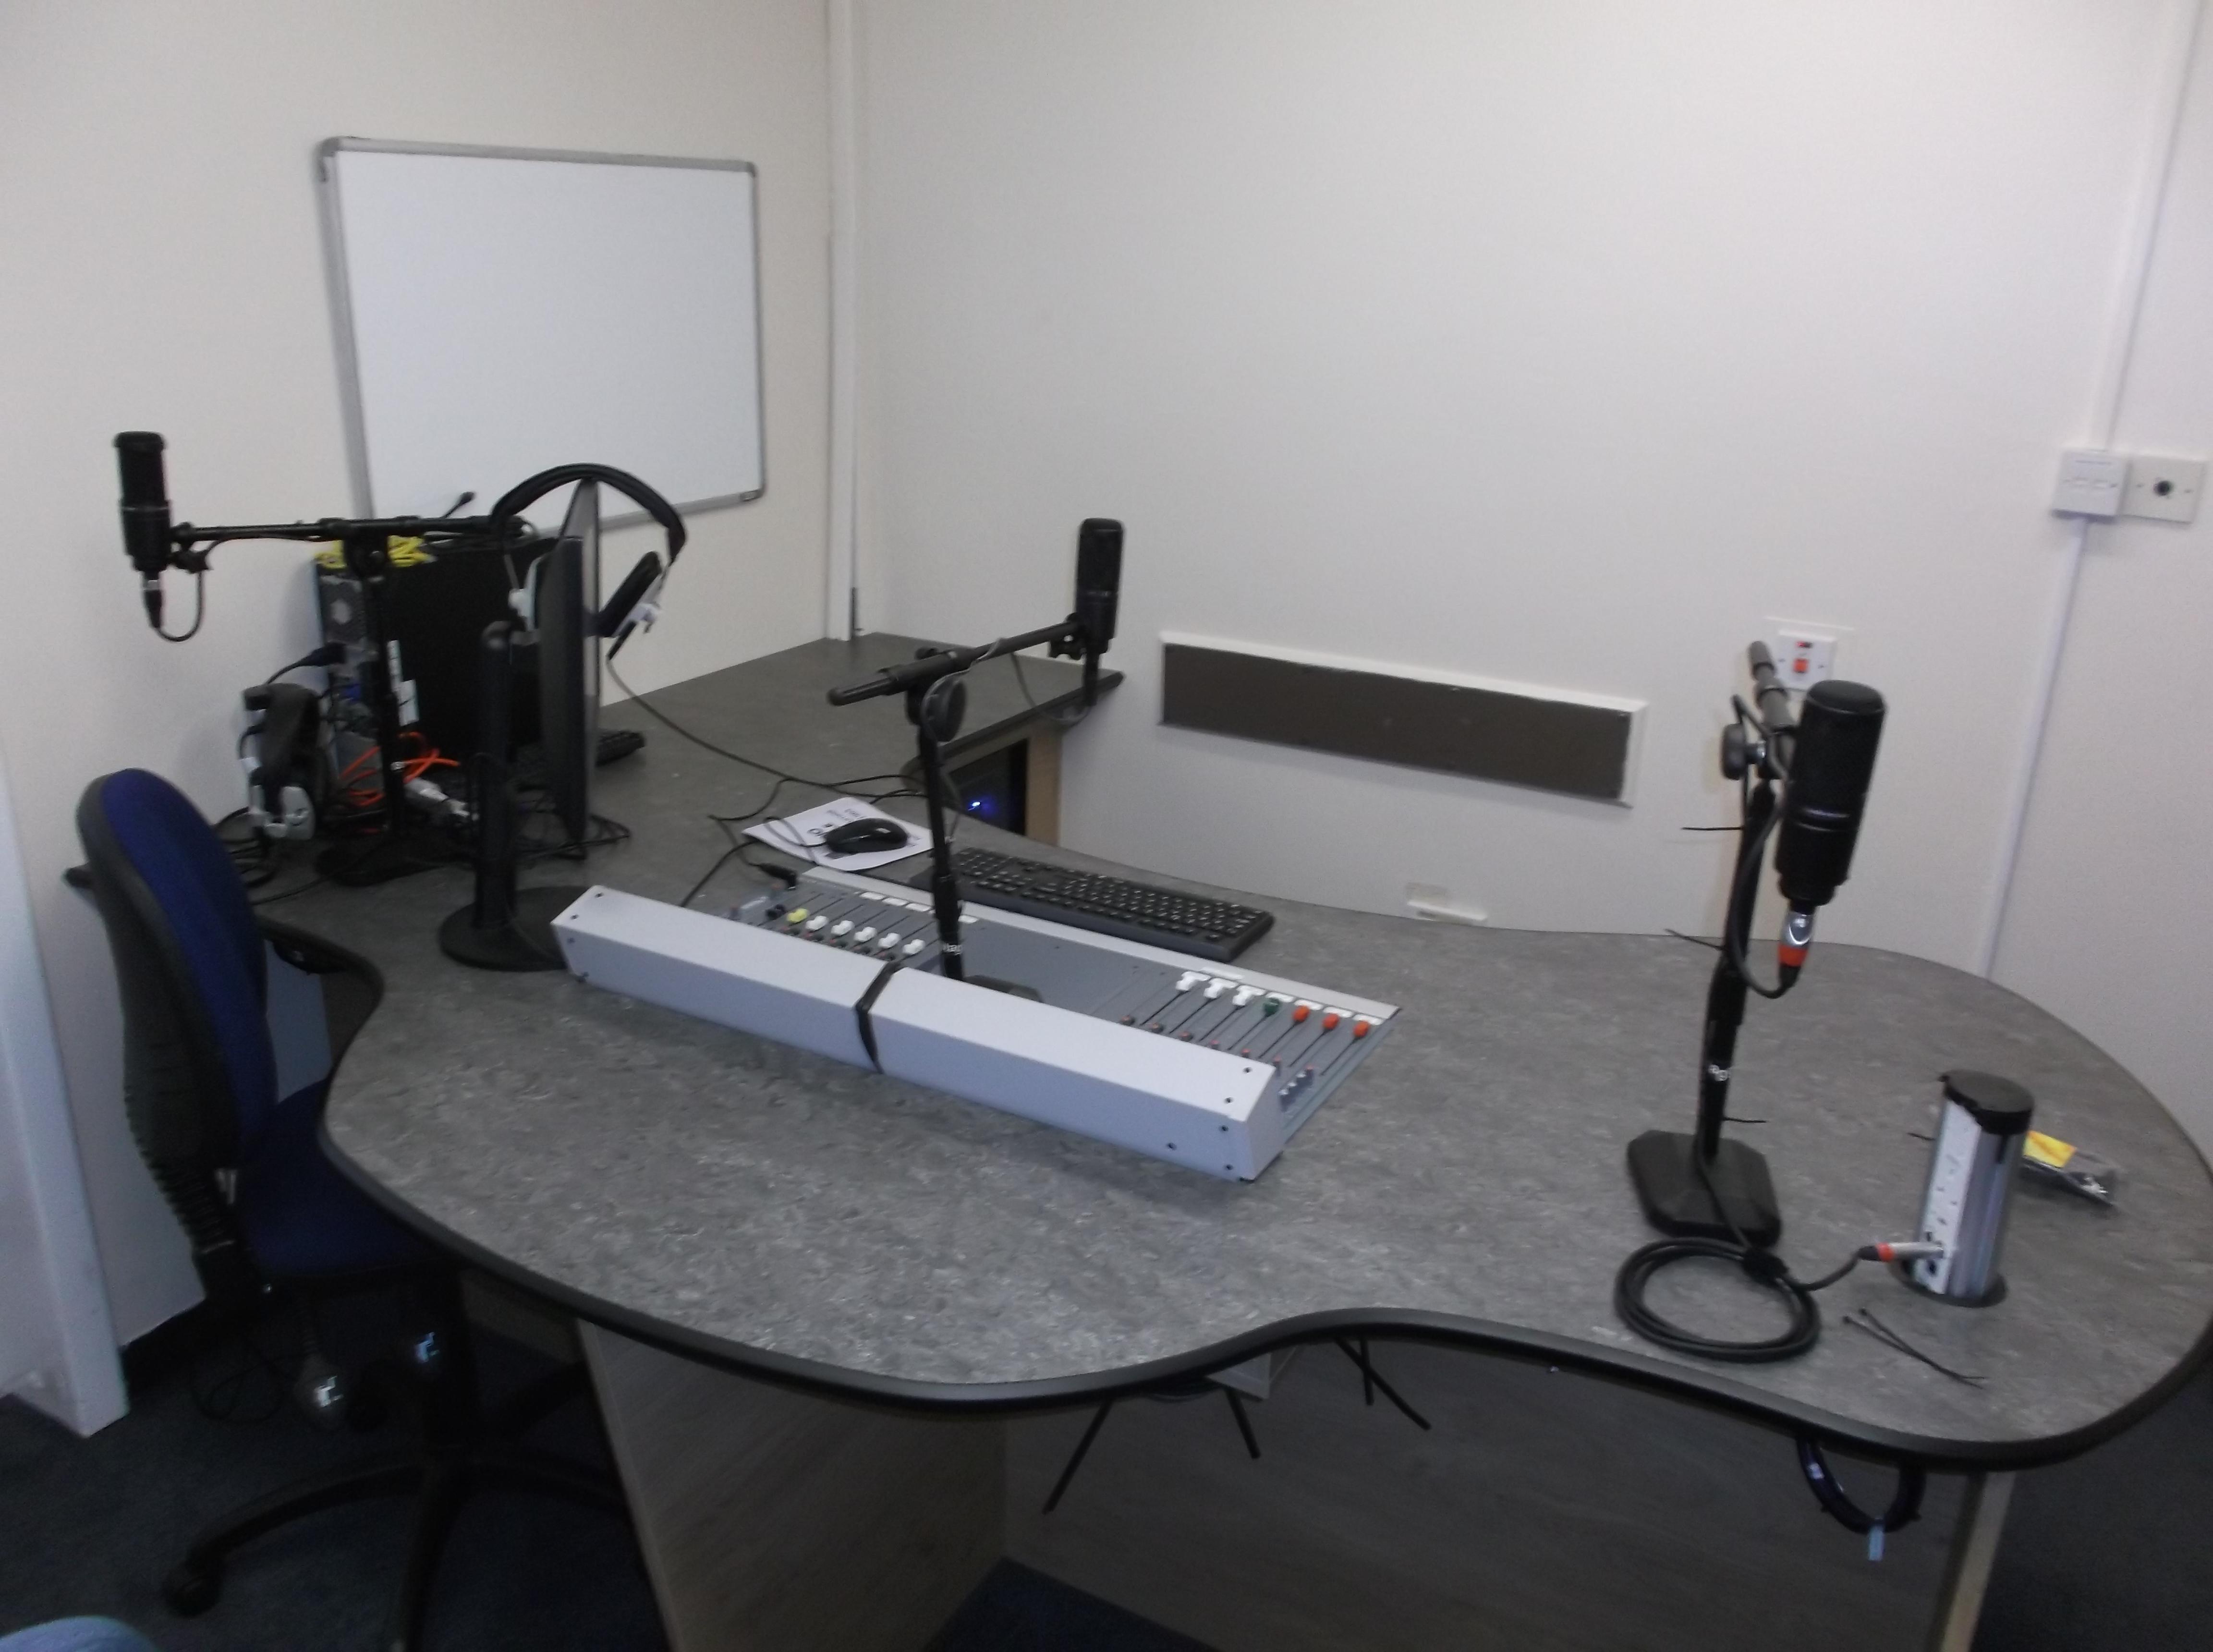 Studio 1 Desktop Overview - Showing New Temporary Mic Stands